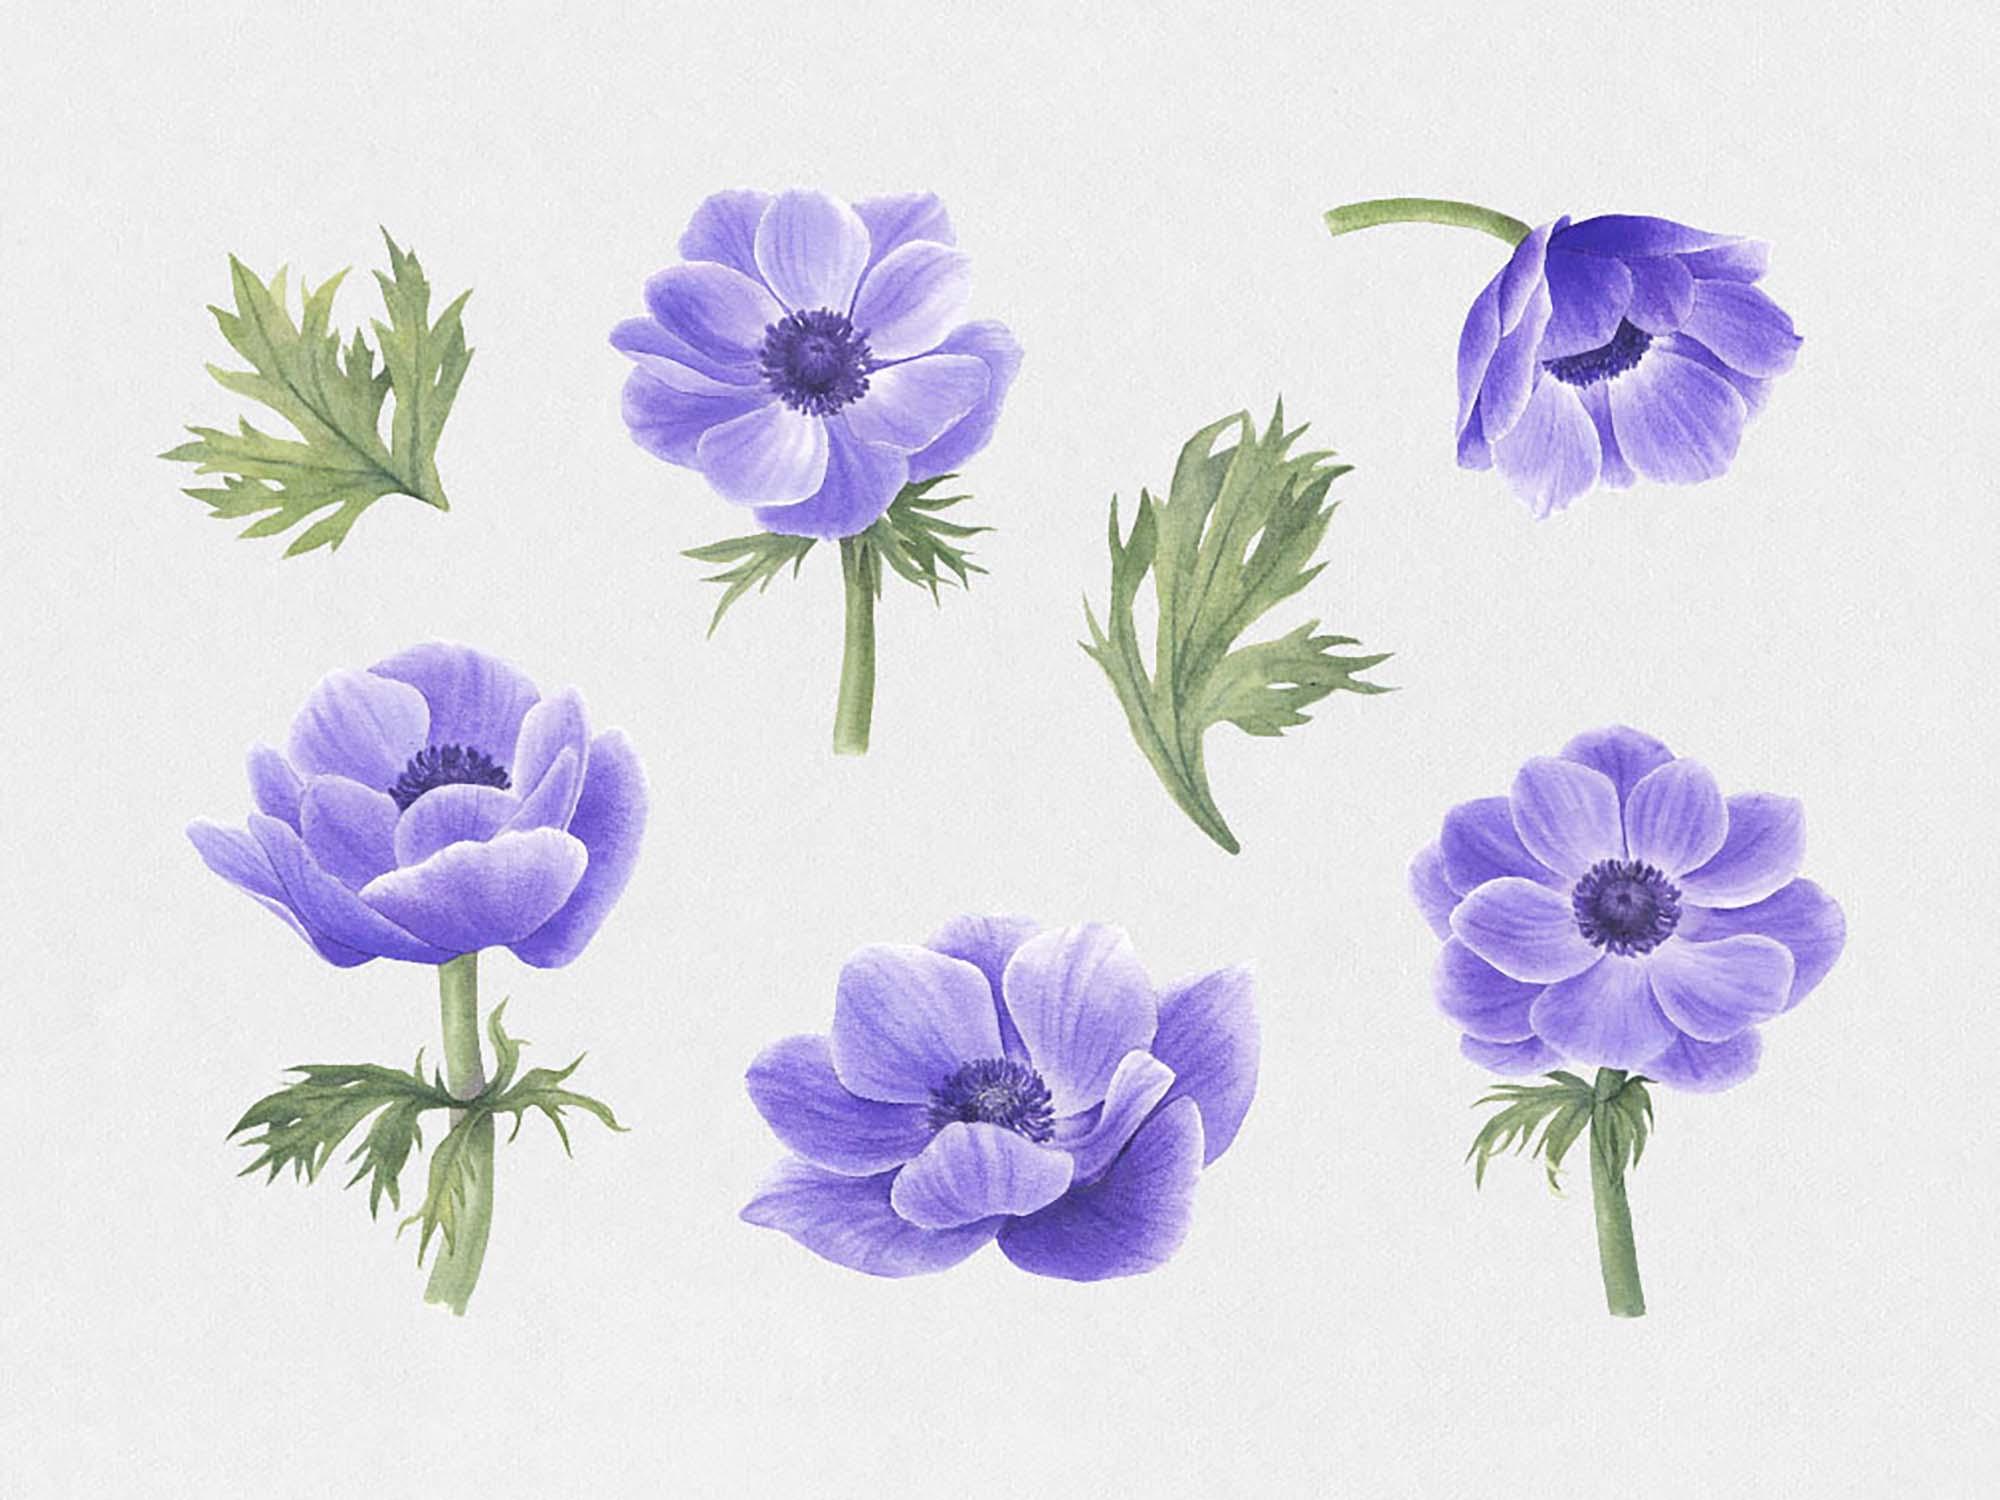 Anemone & Dahlia Flowers Clipart 1